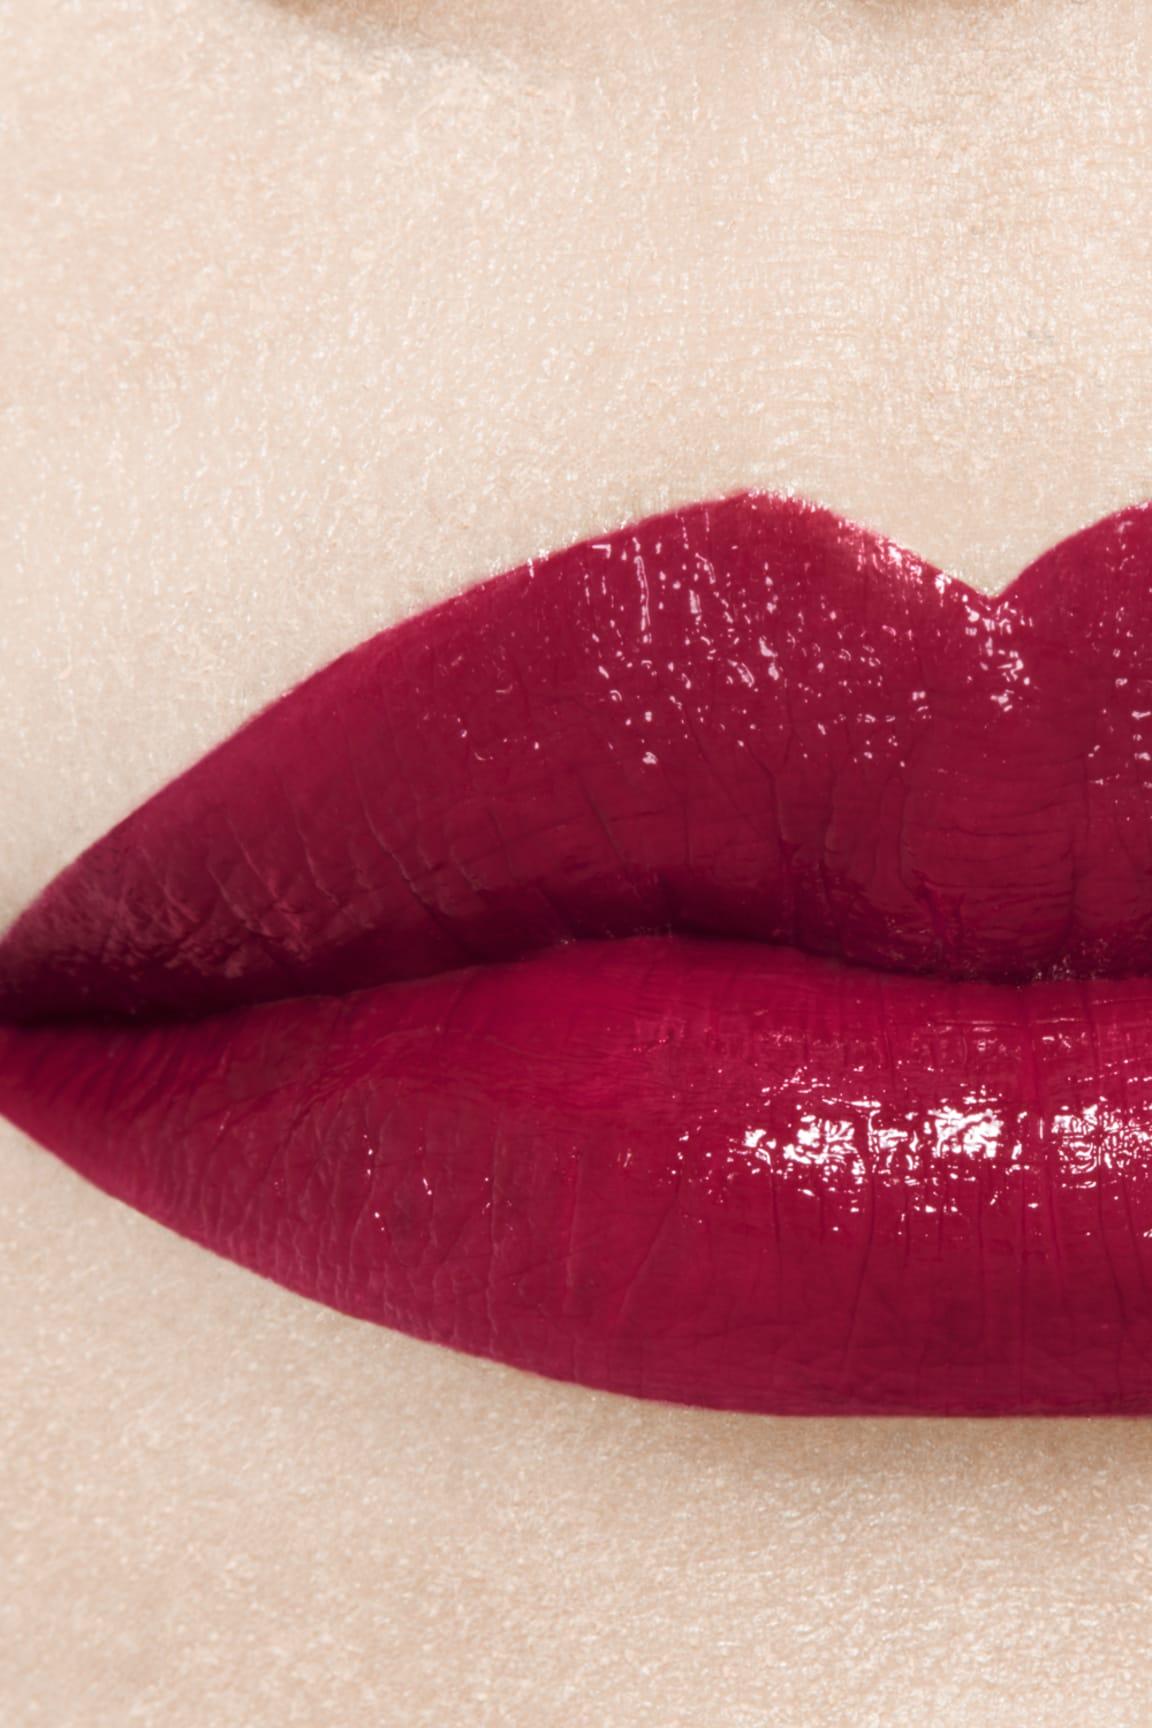 Imagen aplicación de maquillaje 1 - ROUGE ALLURE LAQUE 80 - TIMELESS